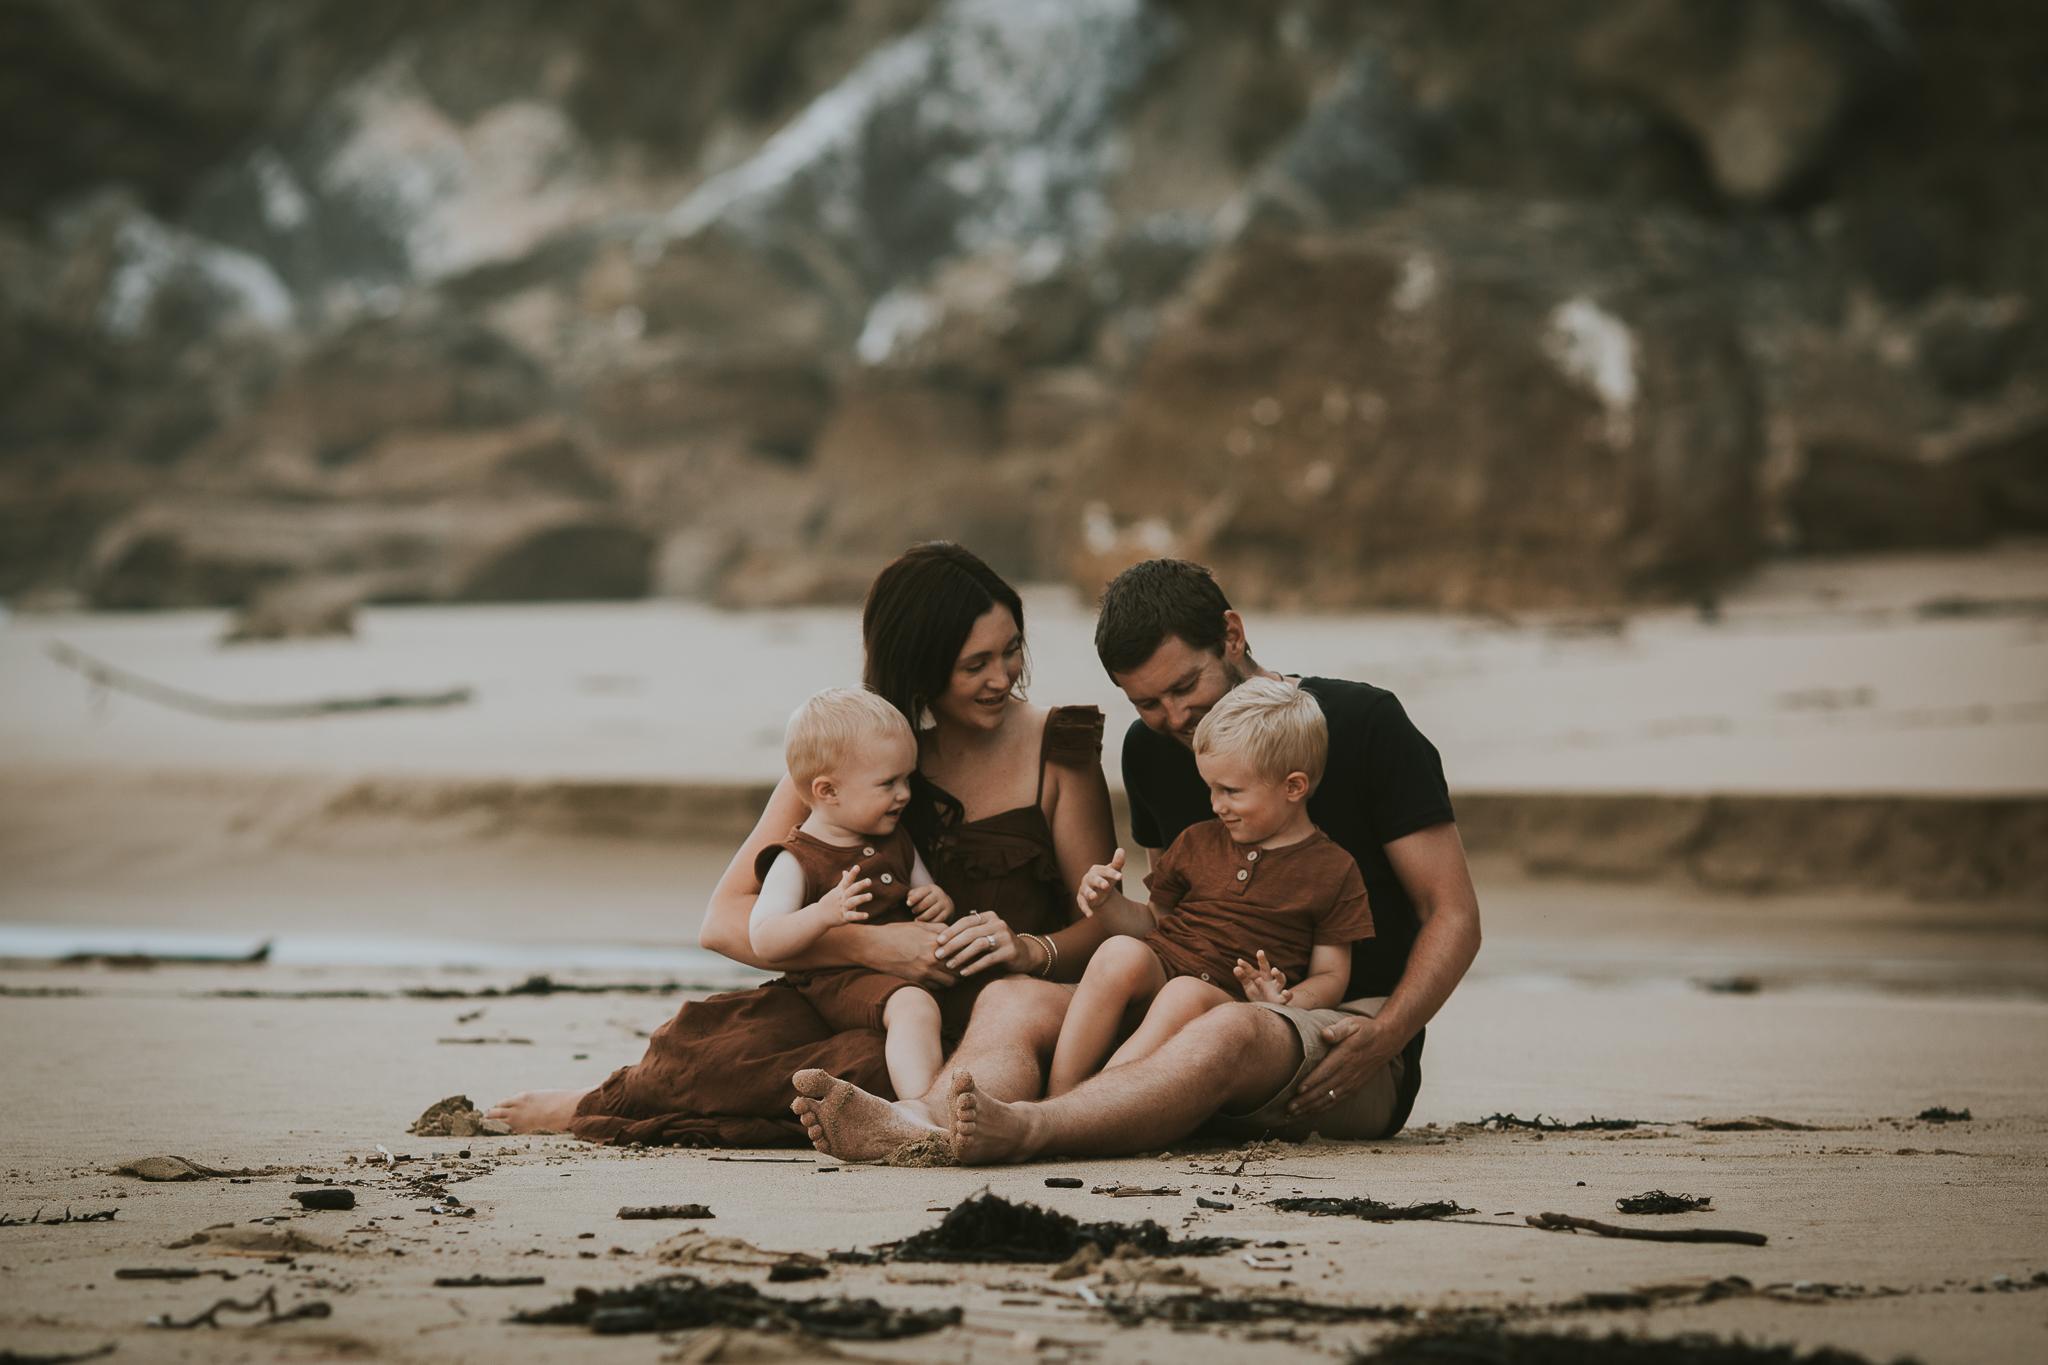 Nz Hawkes Bay Napier Wedding photographer waipatiki beach-21.jpg